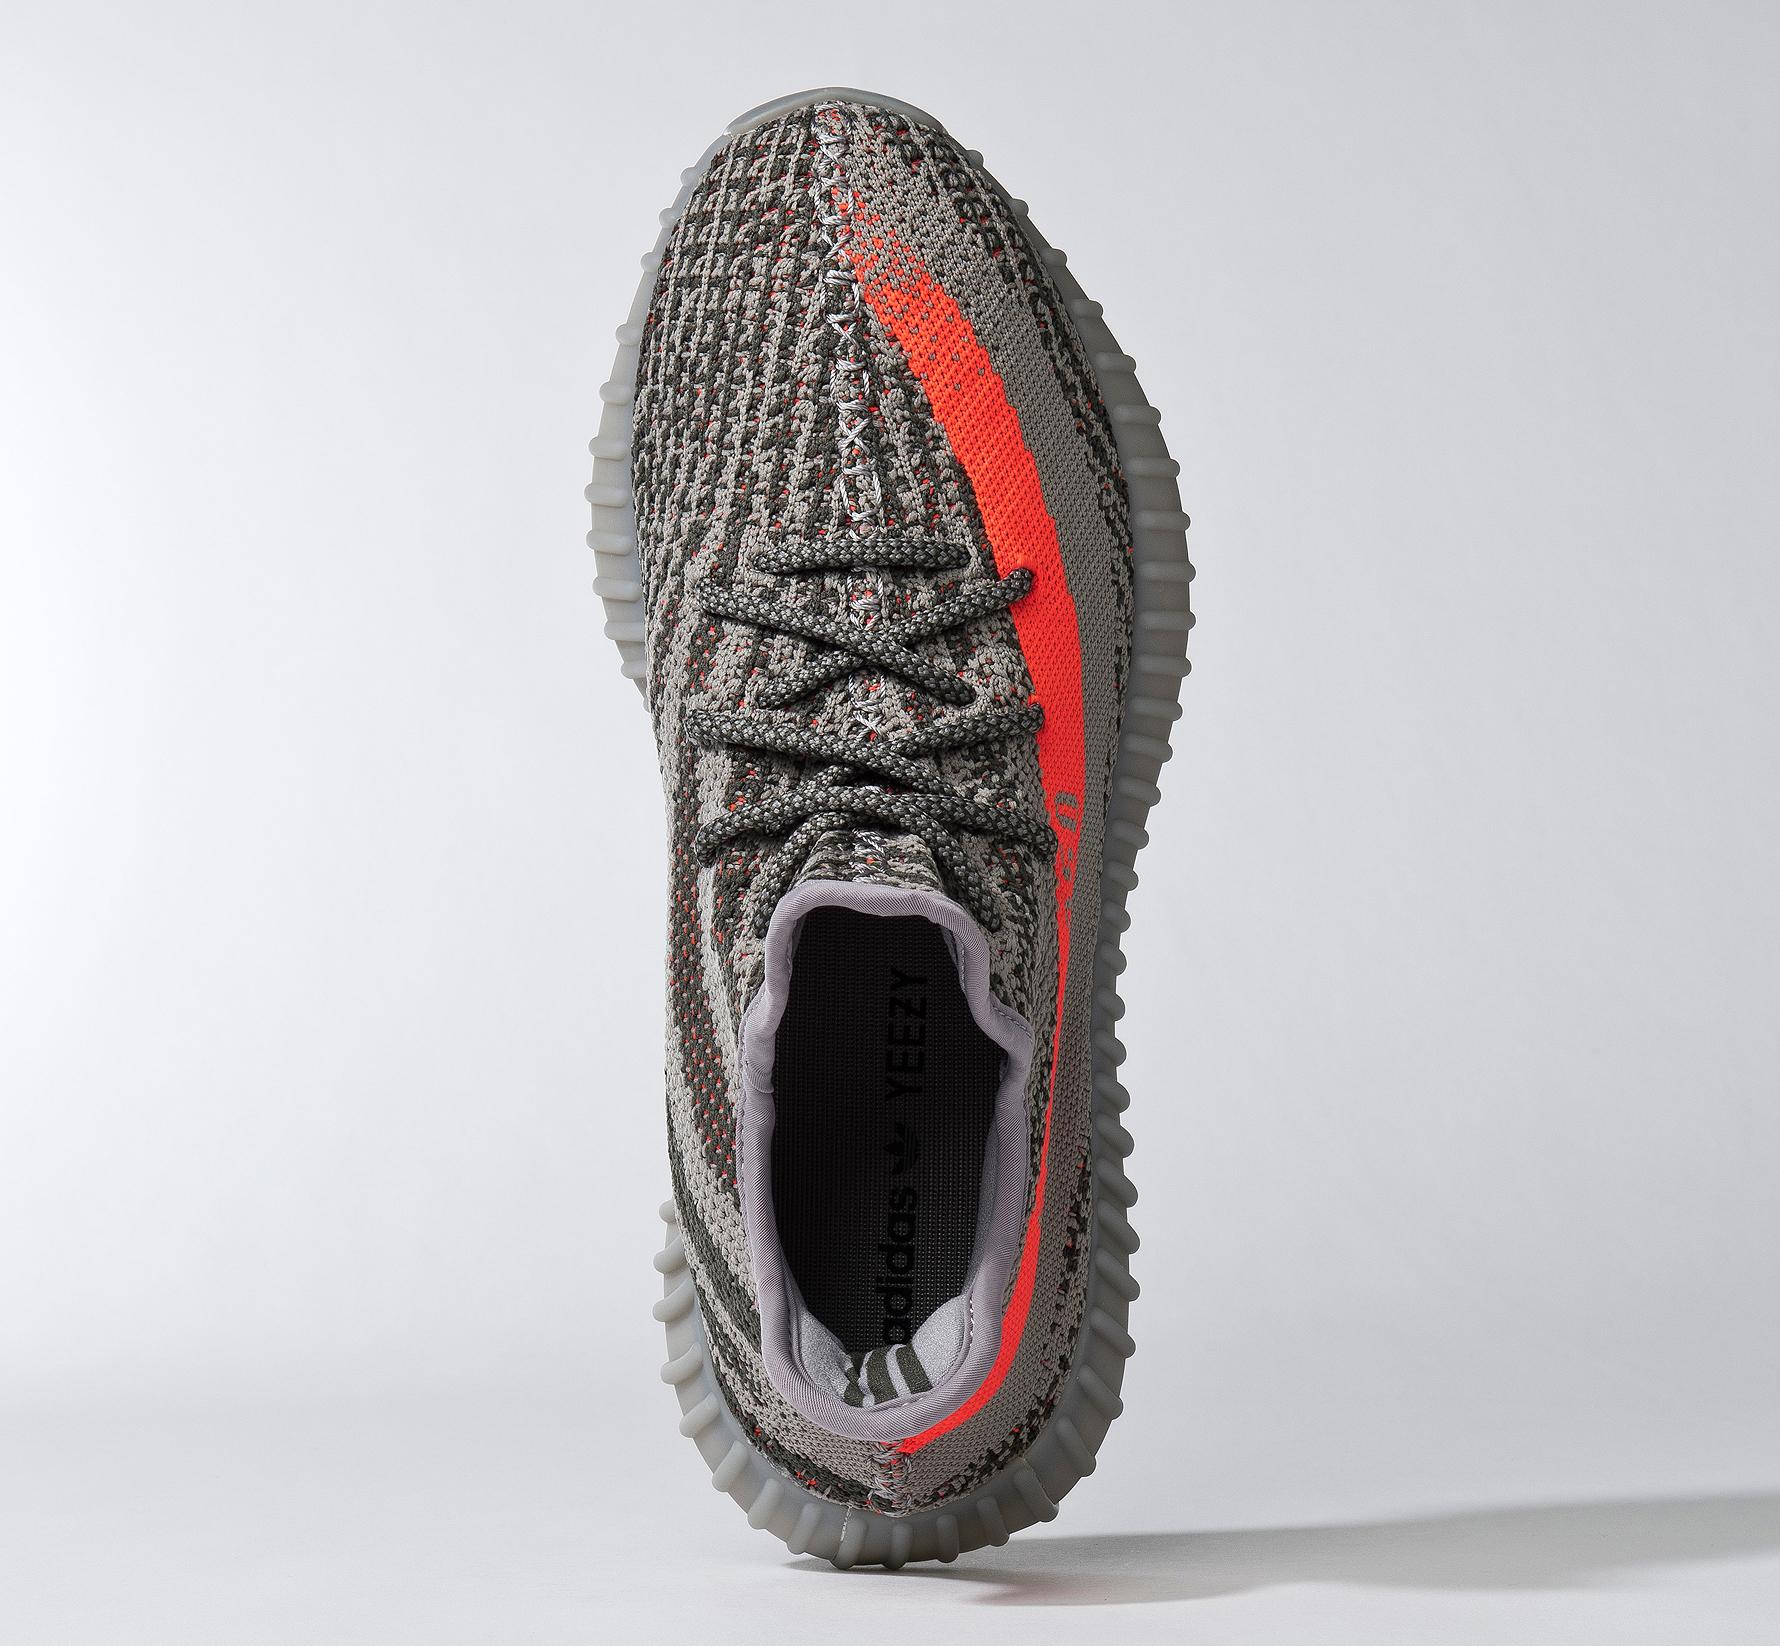 Adidas Yeezy 350 Boost V2 bb1826 Top